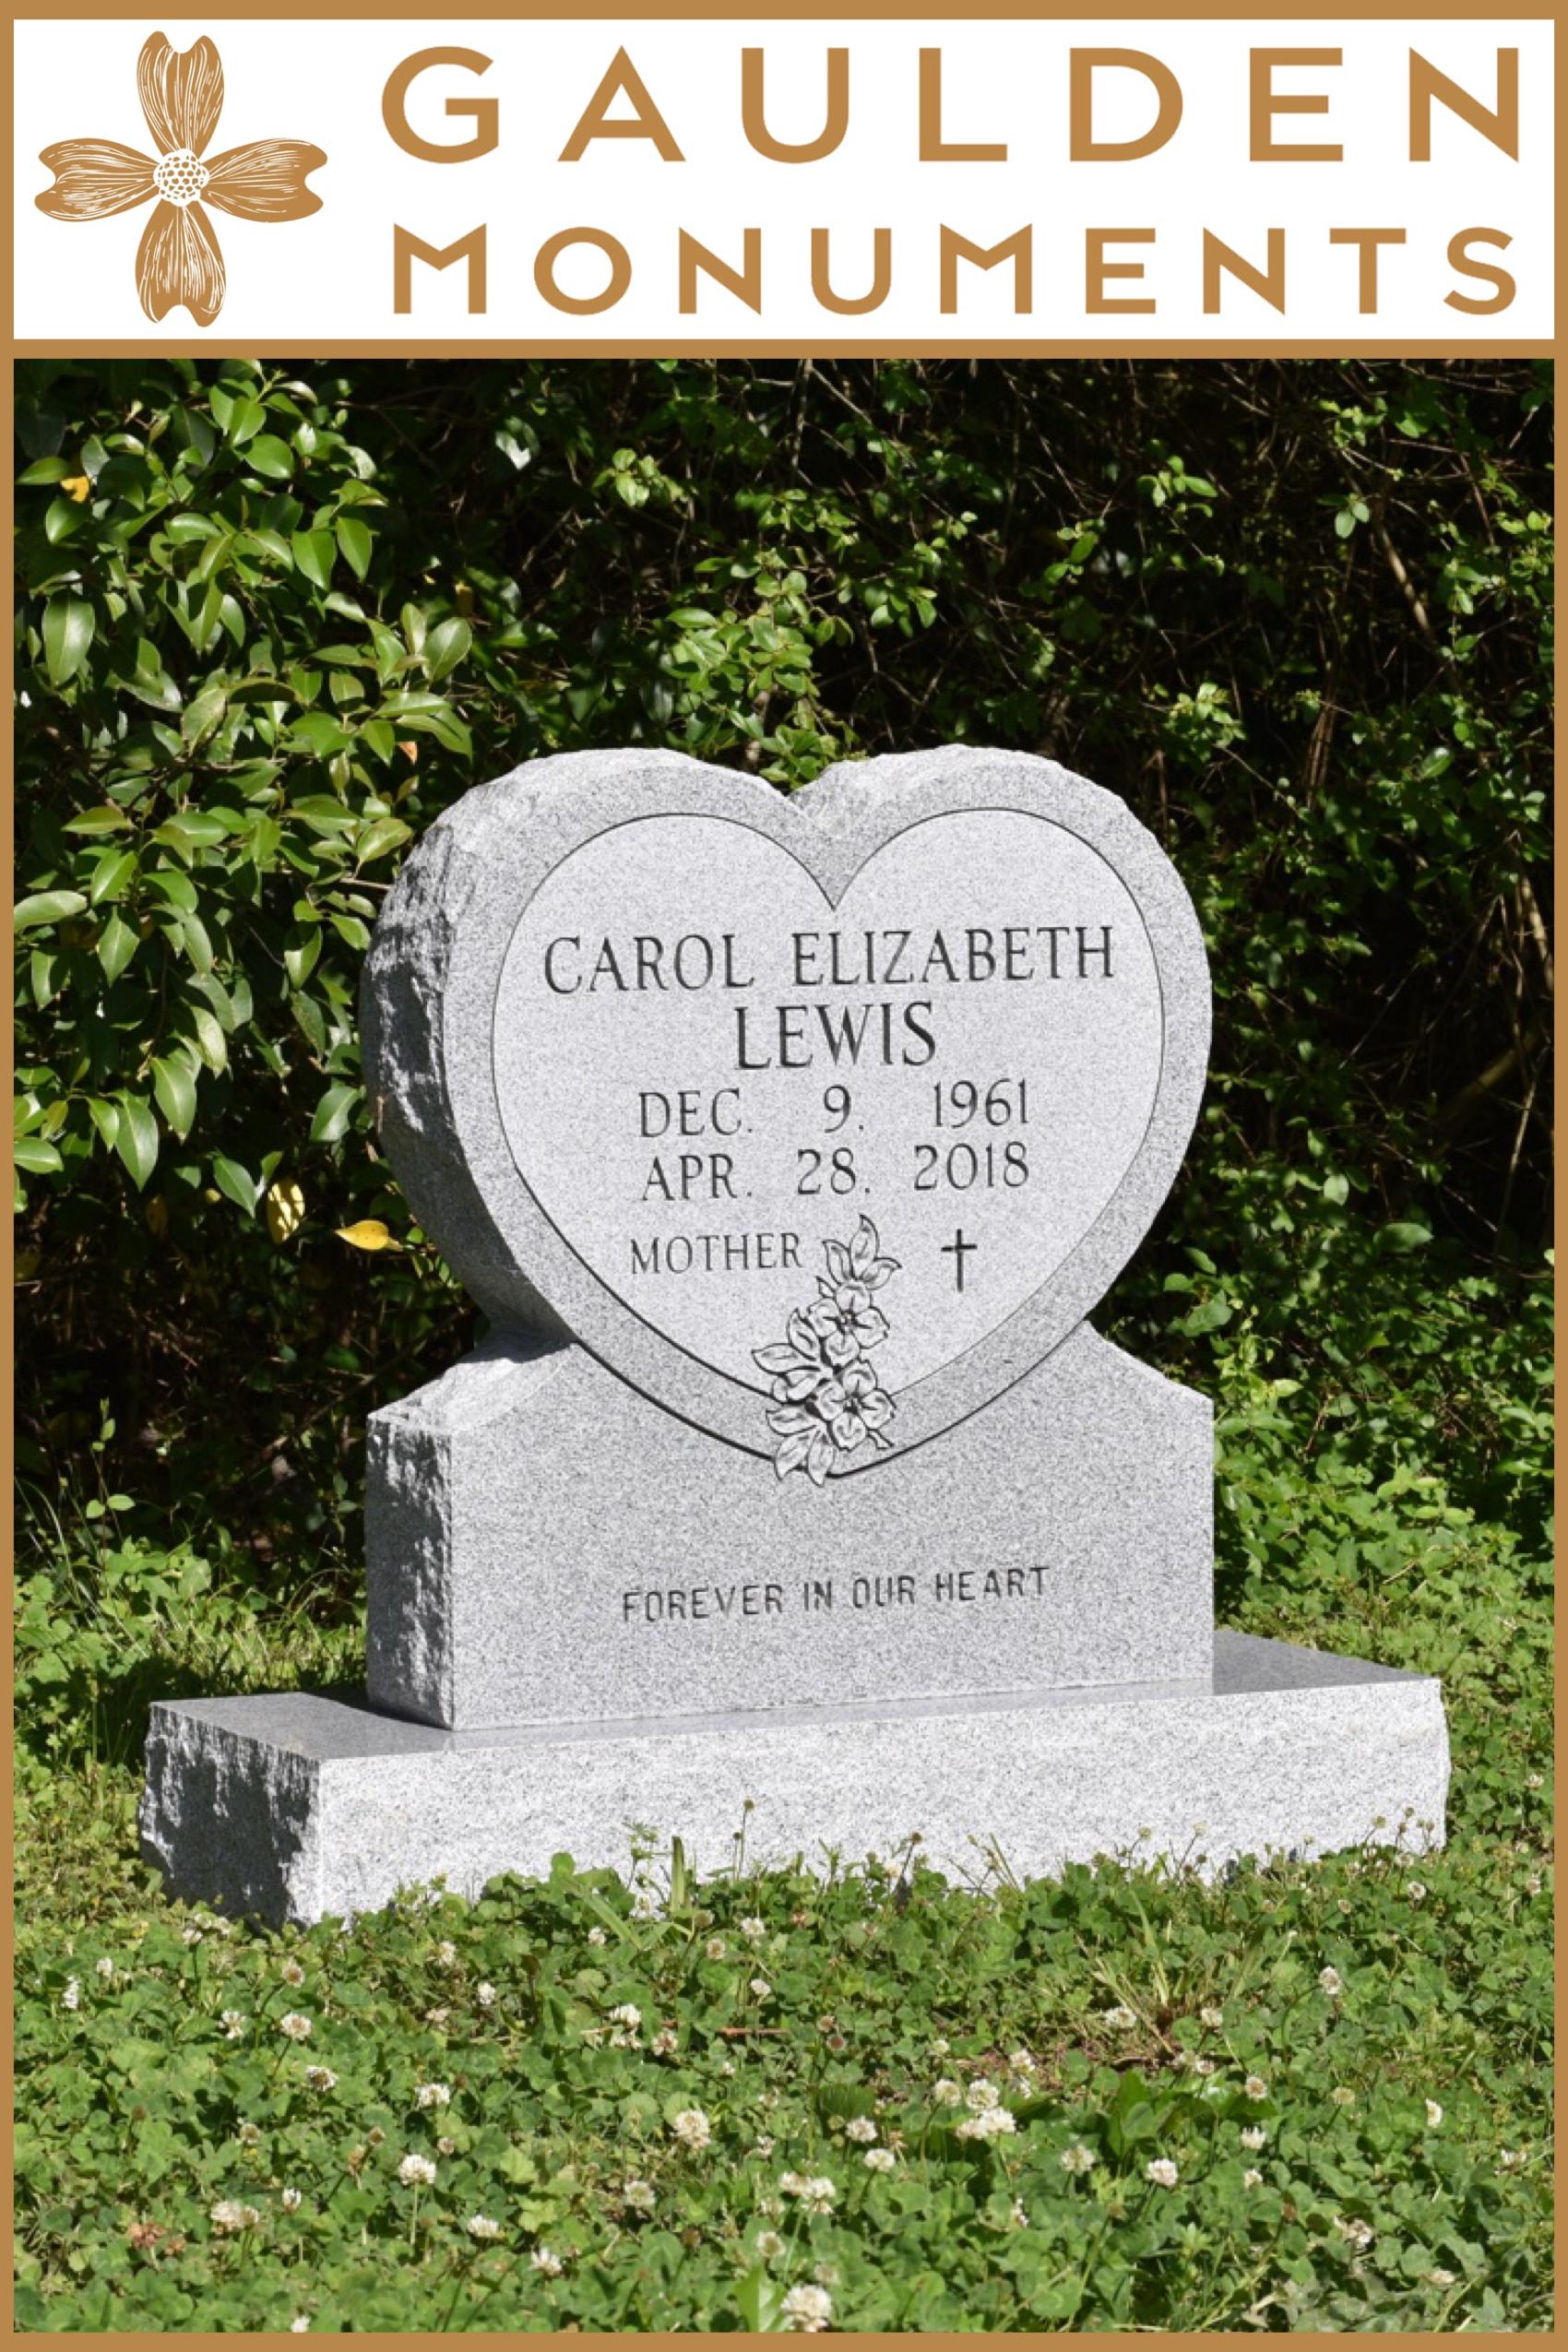 Large Heart Shape Single Upright Headstone Gaulden Monuments Headstones Monument Gravestone